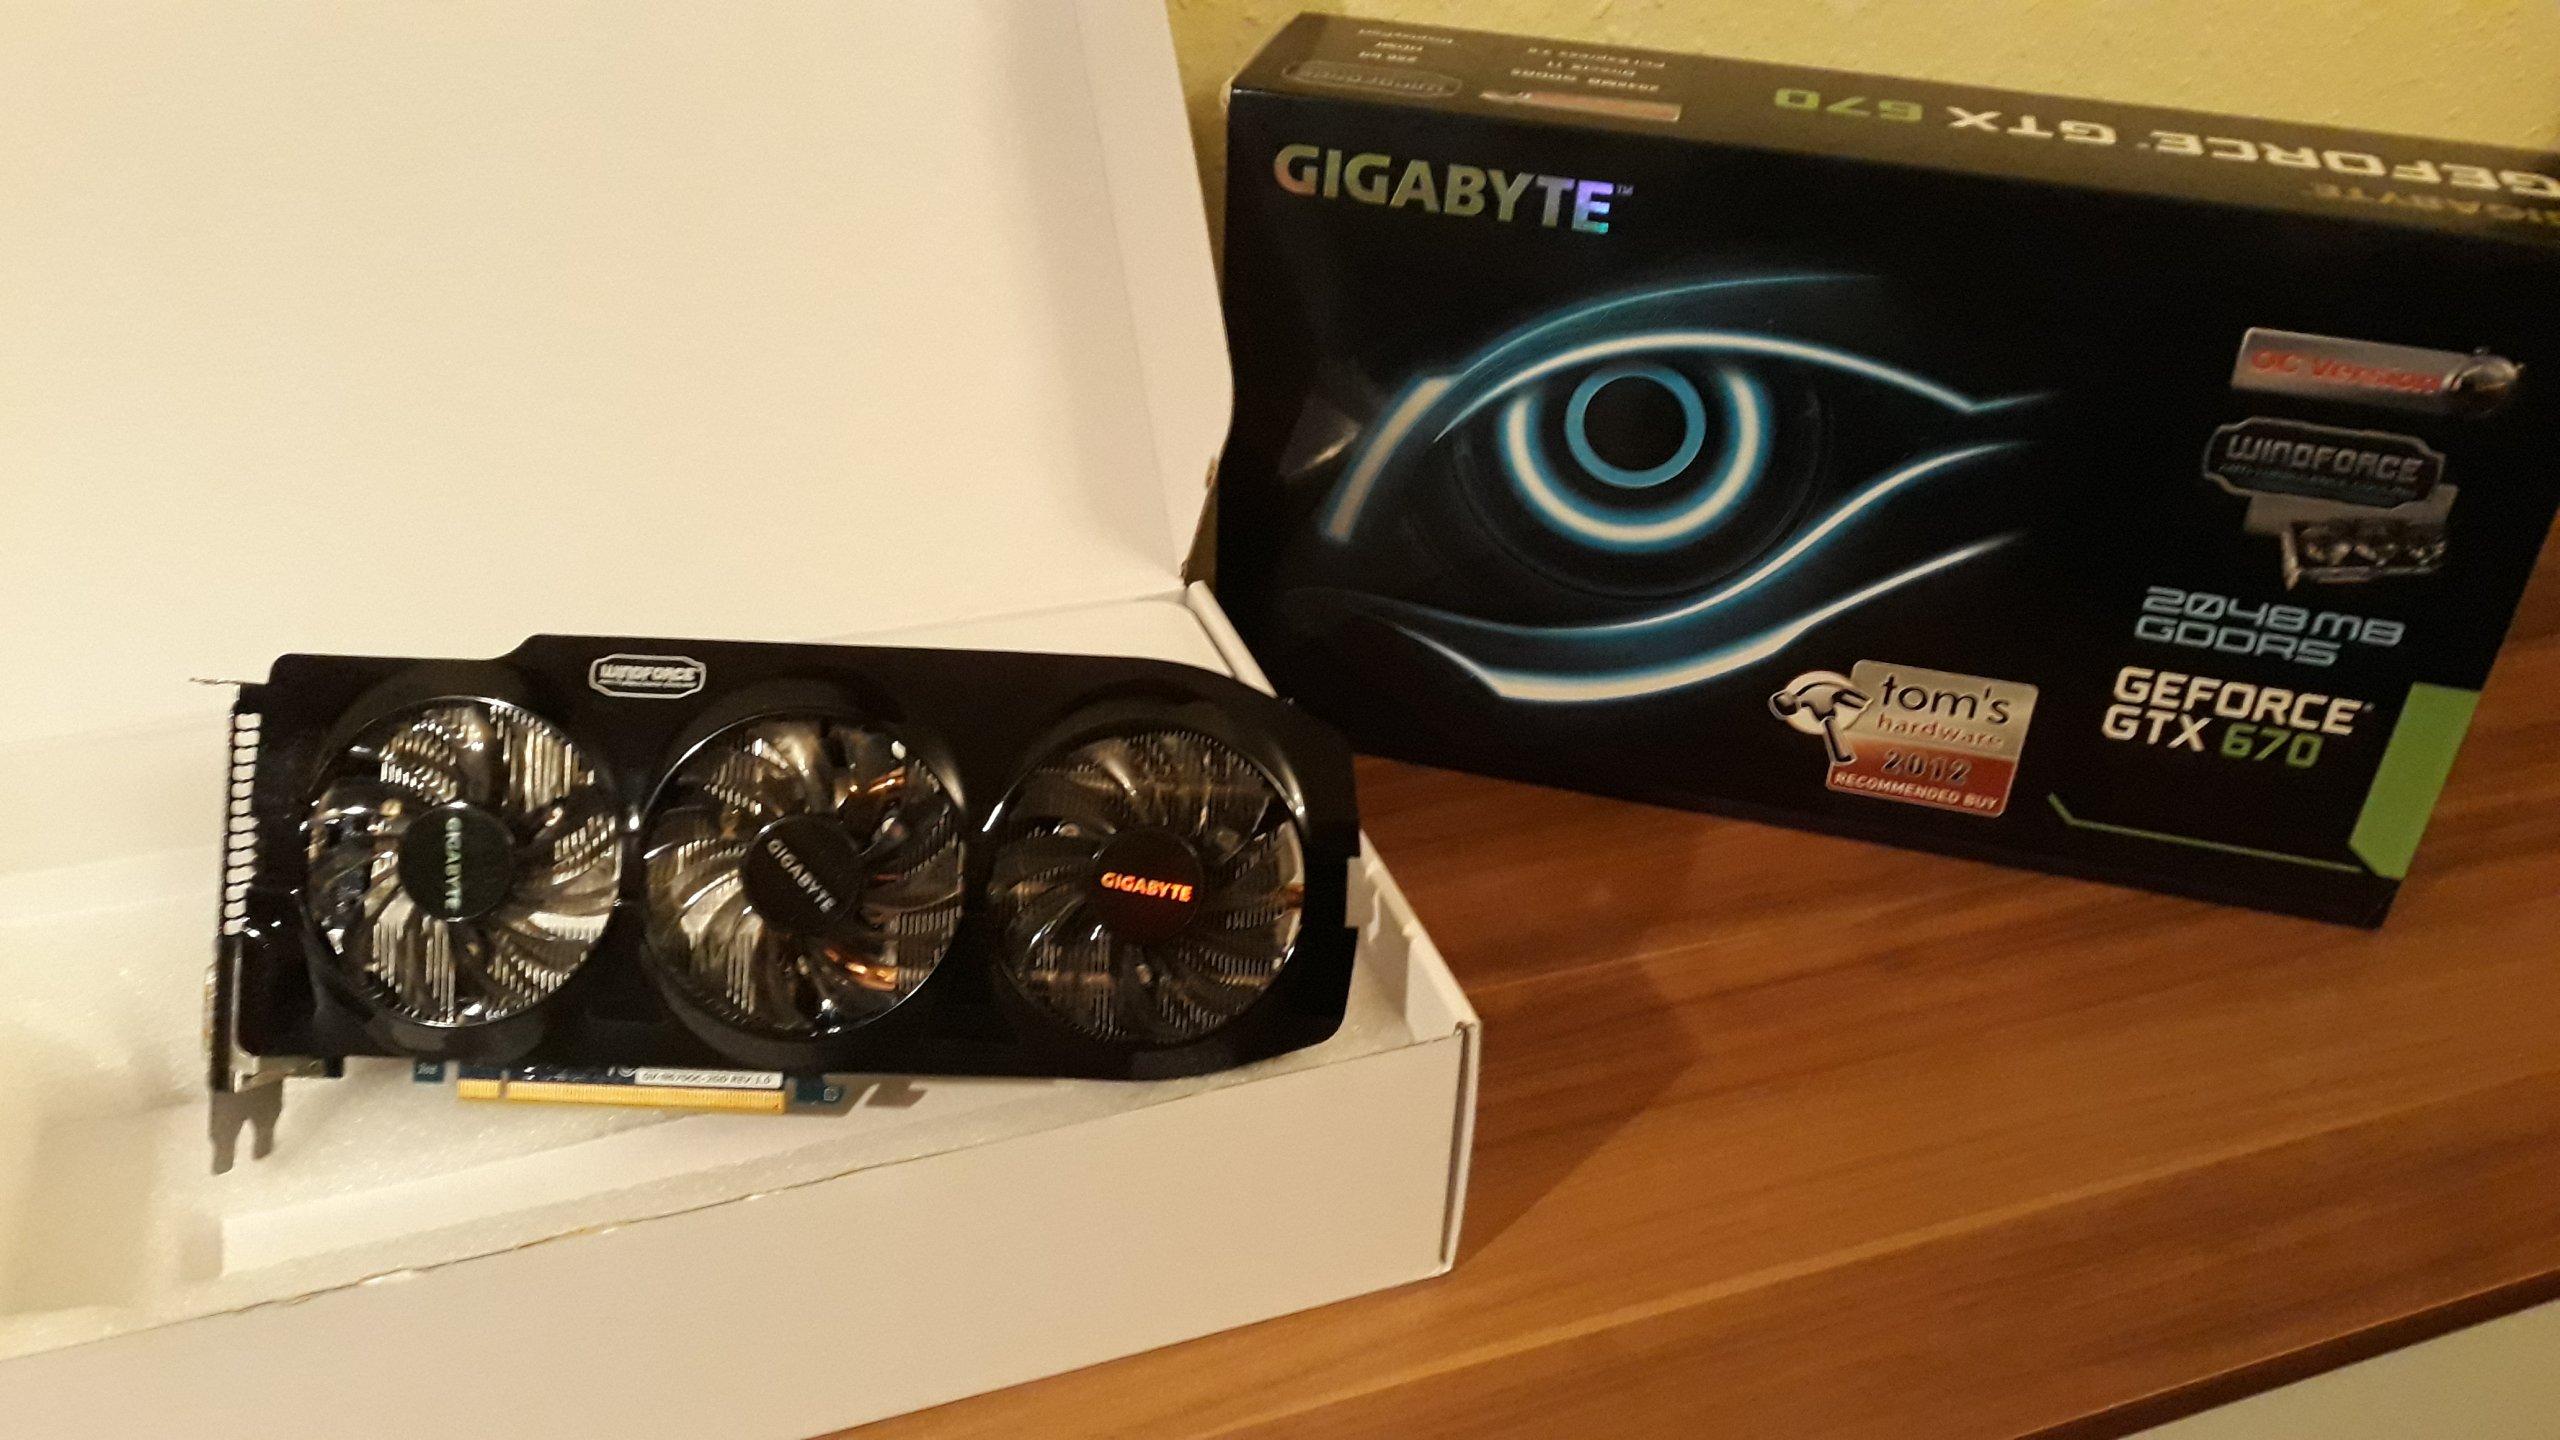 Gigabyte GTX 670 OC 2GB / GWARANCJA!